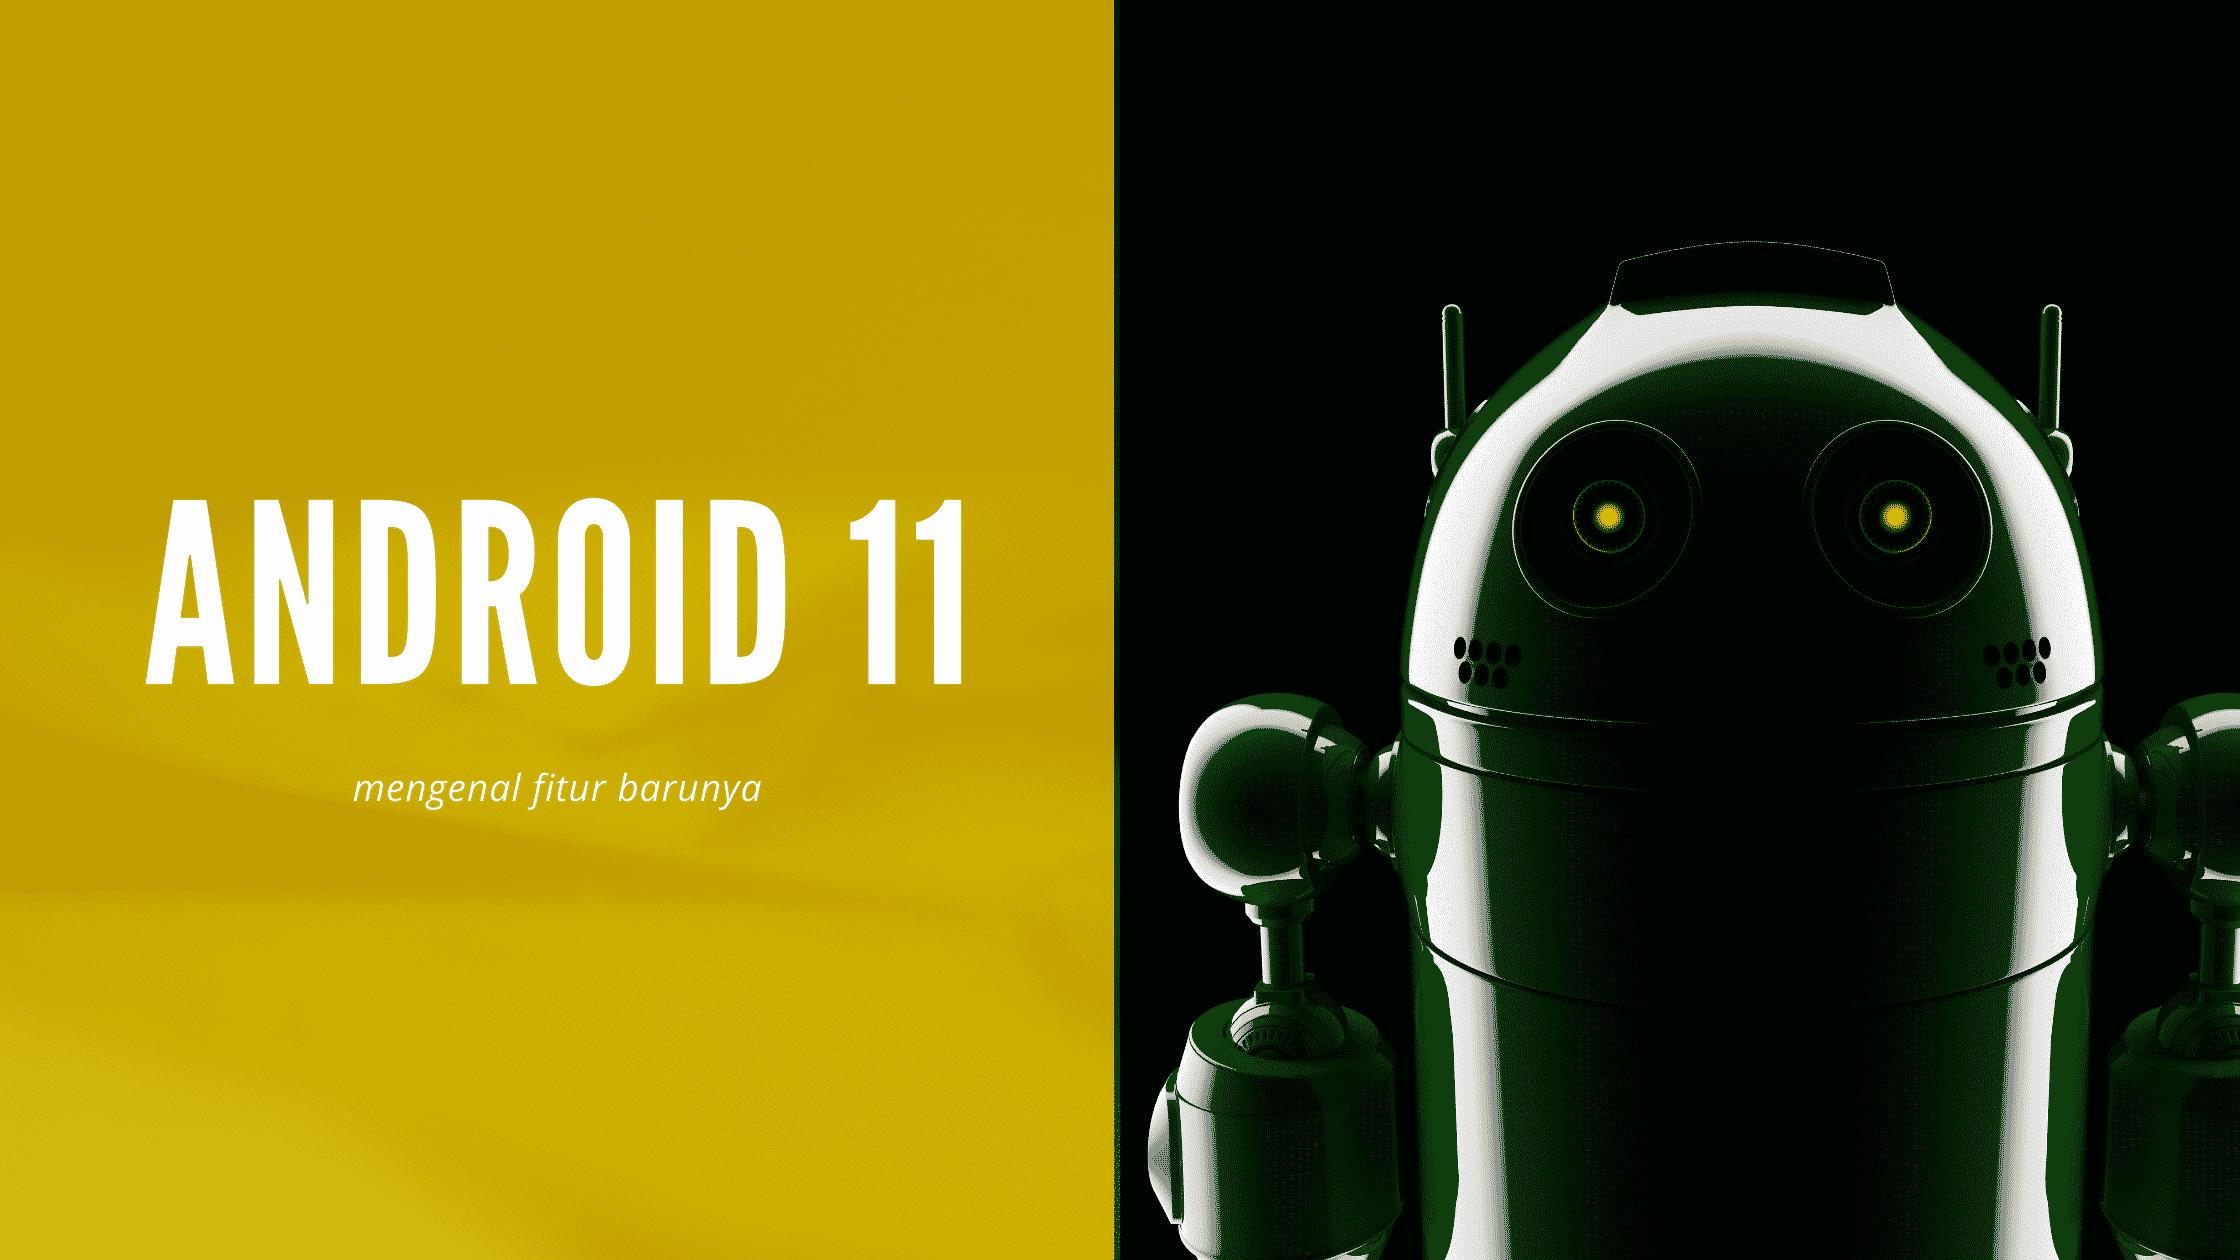 Fitur baru Android 11